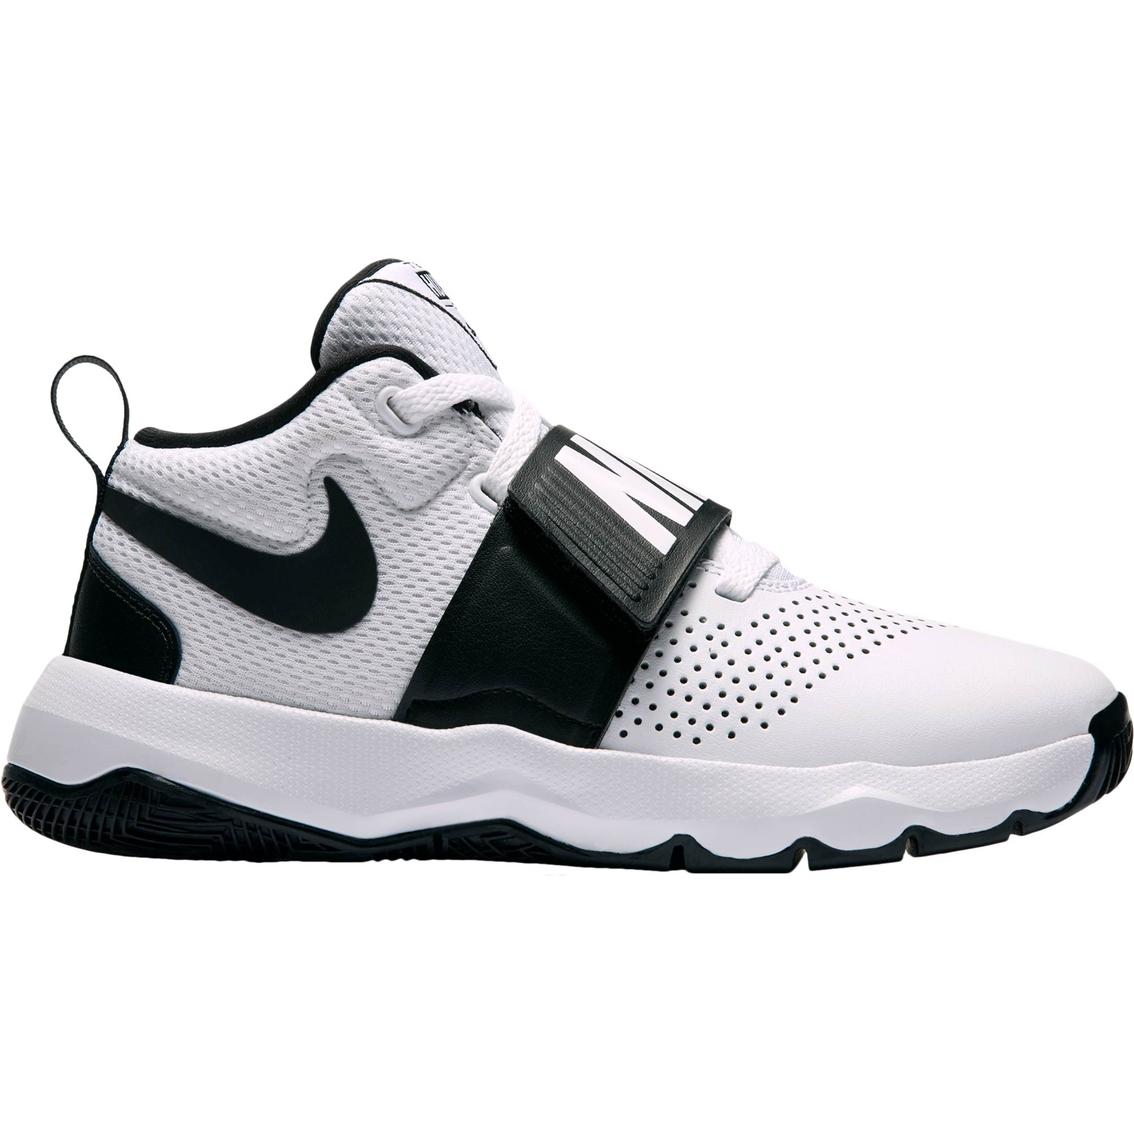 separation shoes 03f3b fc8f2 Nike Grade School Boys Team Hustle D 8 Basketball Shoes